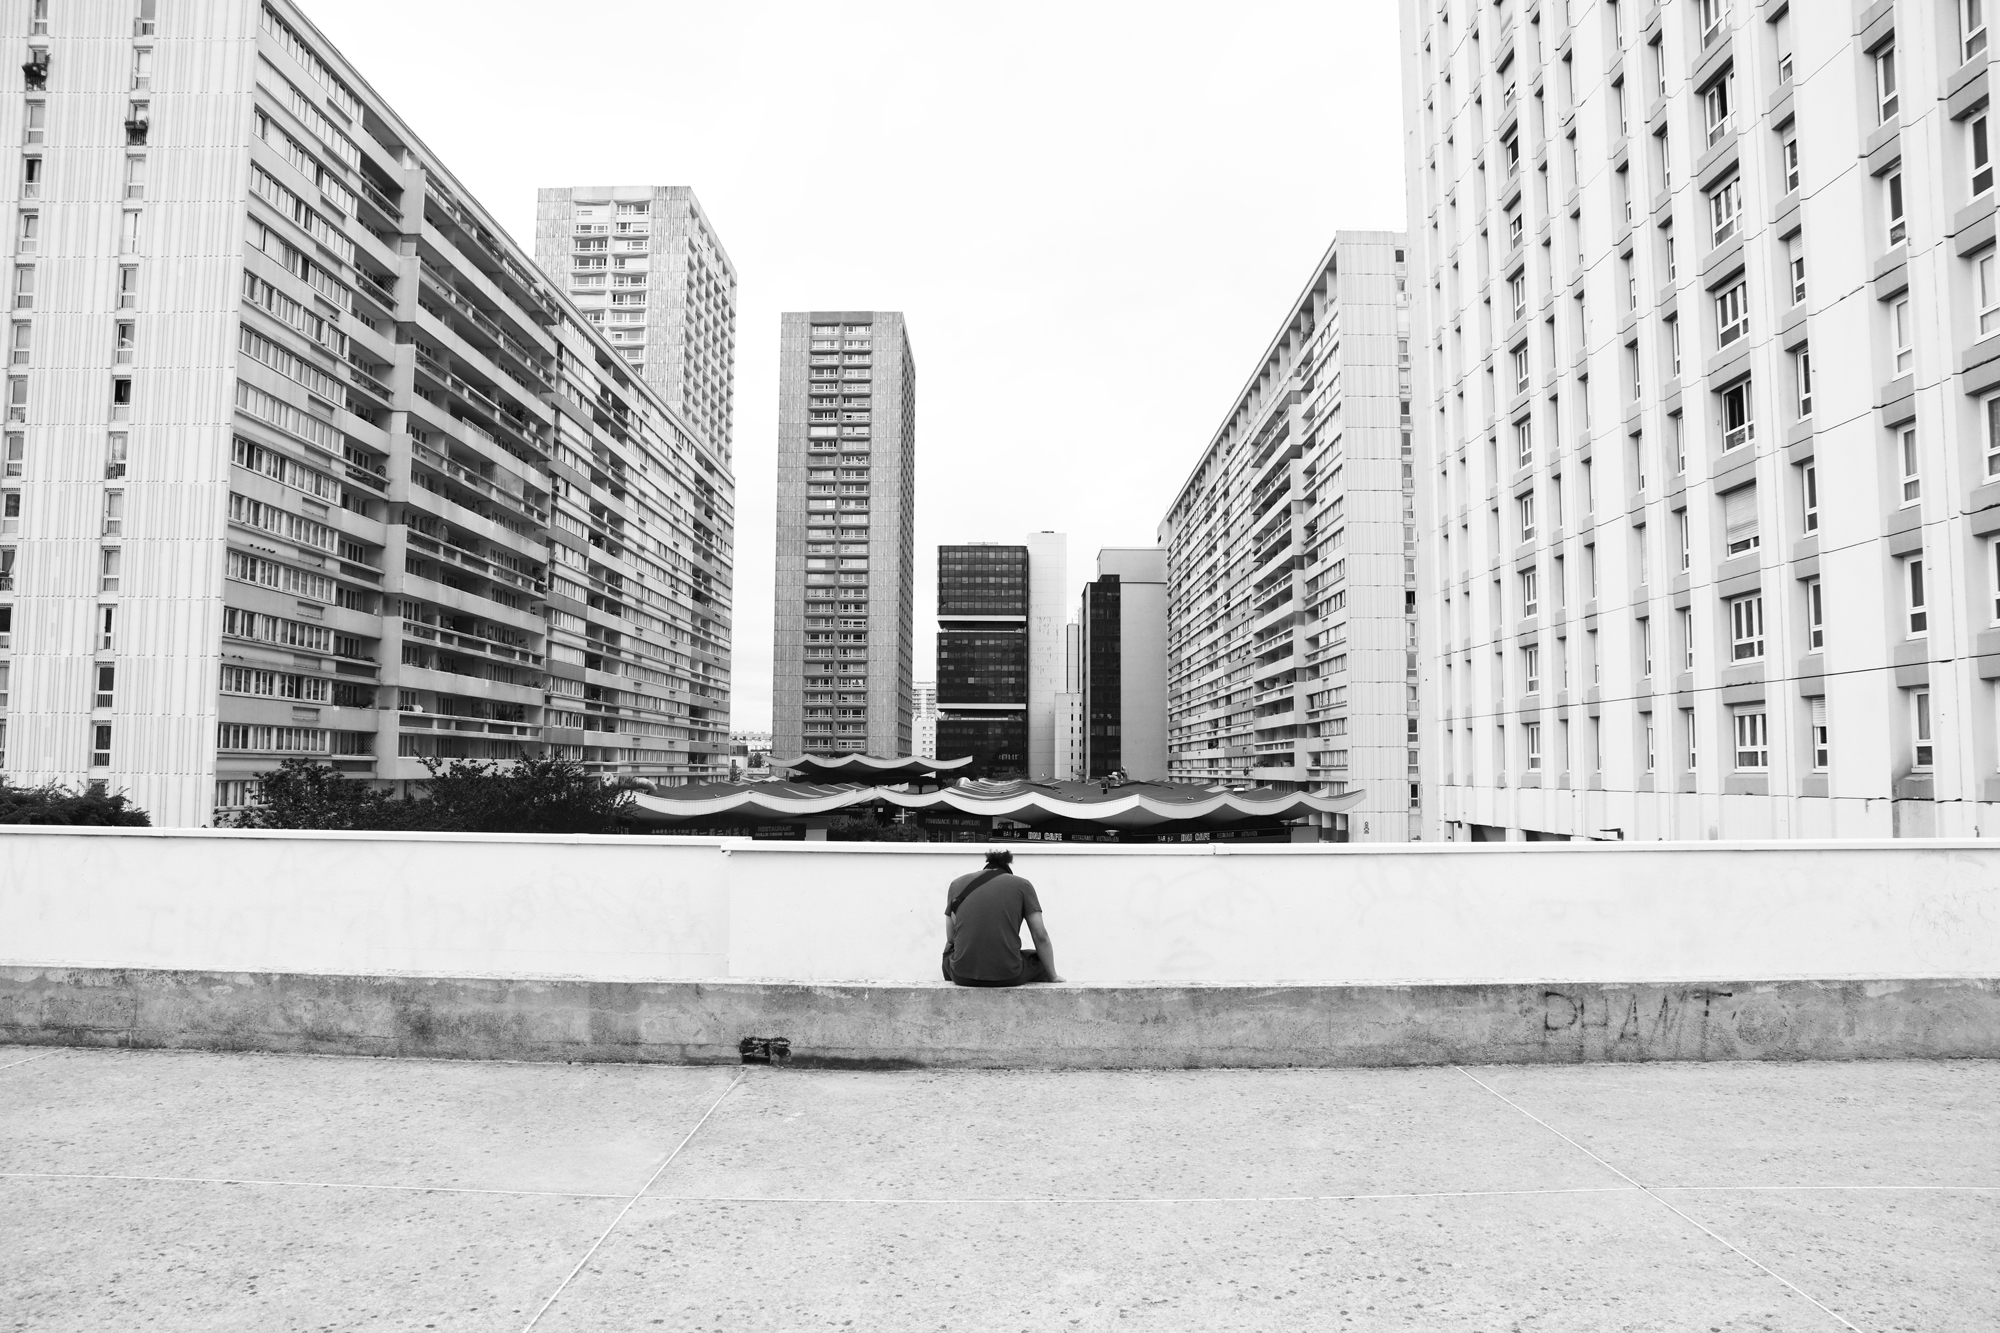 """Street viewer"" - Olympiades, Paris (2020). © Clémence Rougetet"